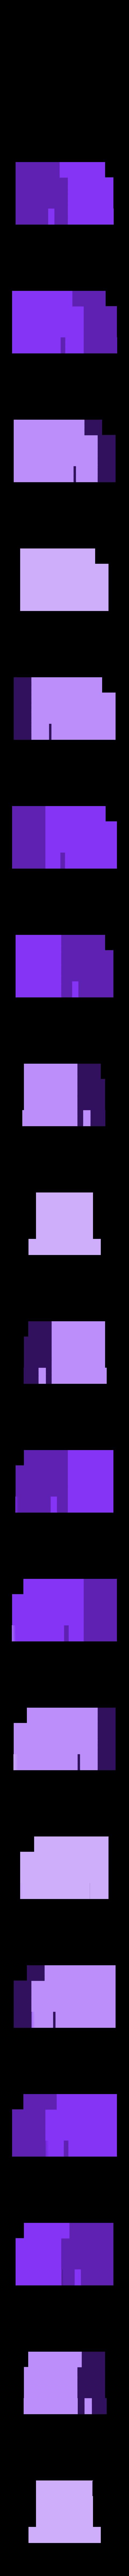 MakerBot_-_Rear_Engine-_SCALED-2.STL Download free STL file 4-8-8-4 Big Boy Locomotive • 3D printer object, RaymondDeLuca